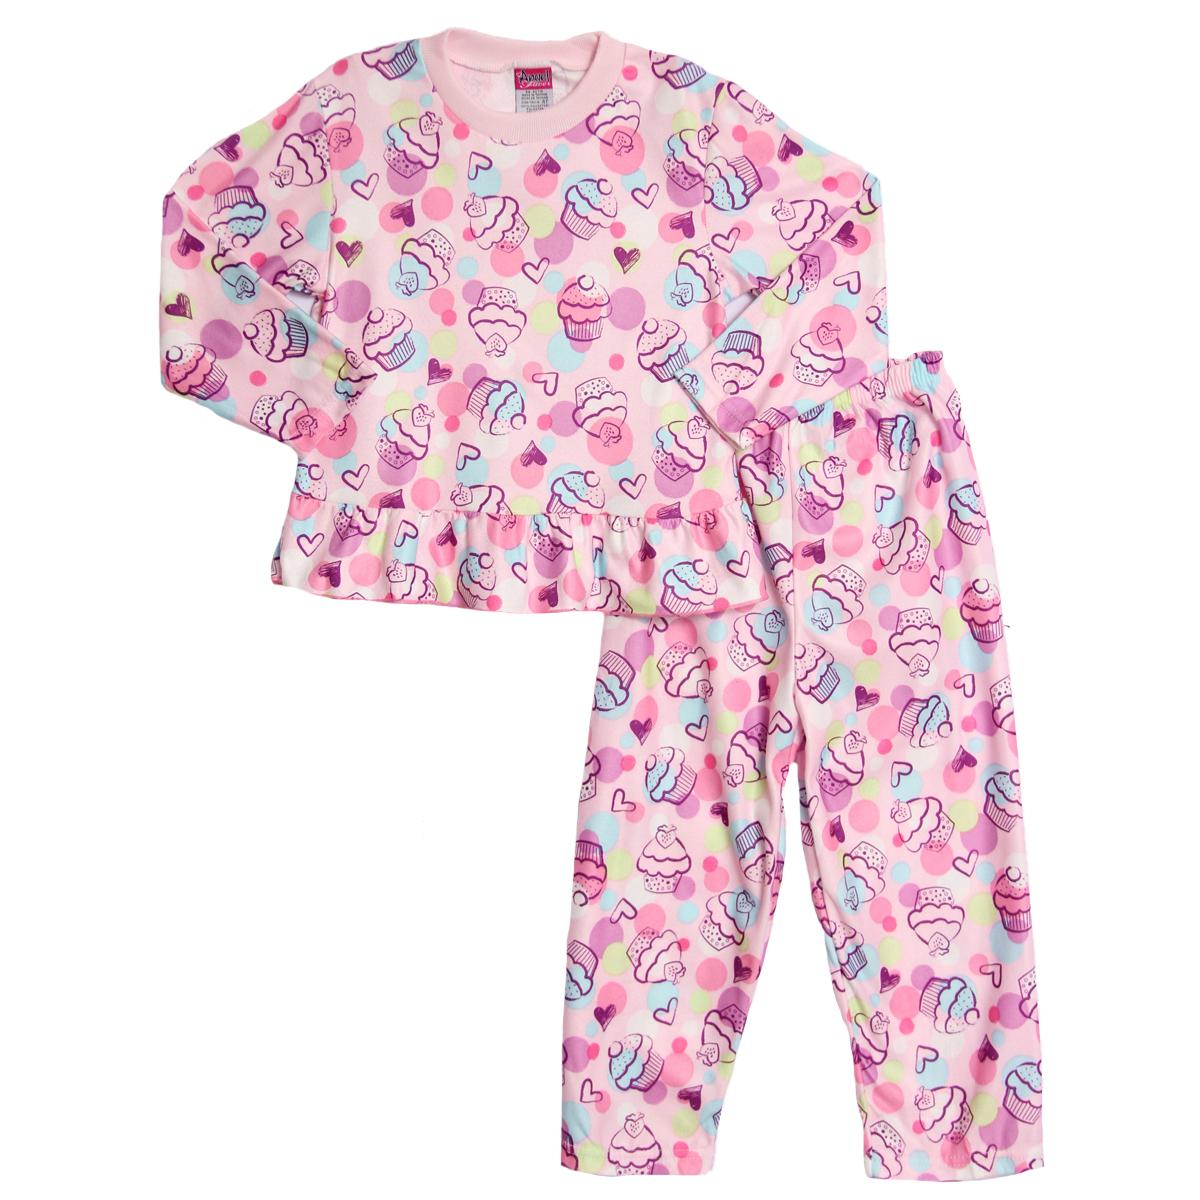 Angel Face Toddler Girls 2 Piece Pink Cupcake Flannel Pajama Shirt Pants Pjs Set at Sears.com